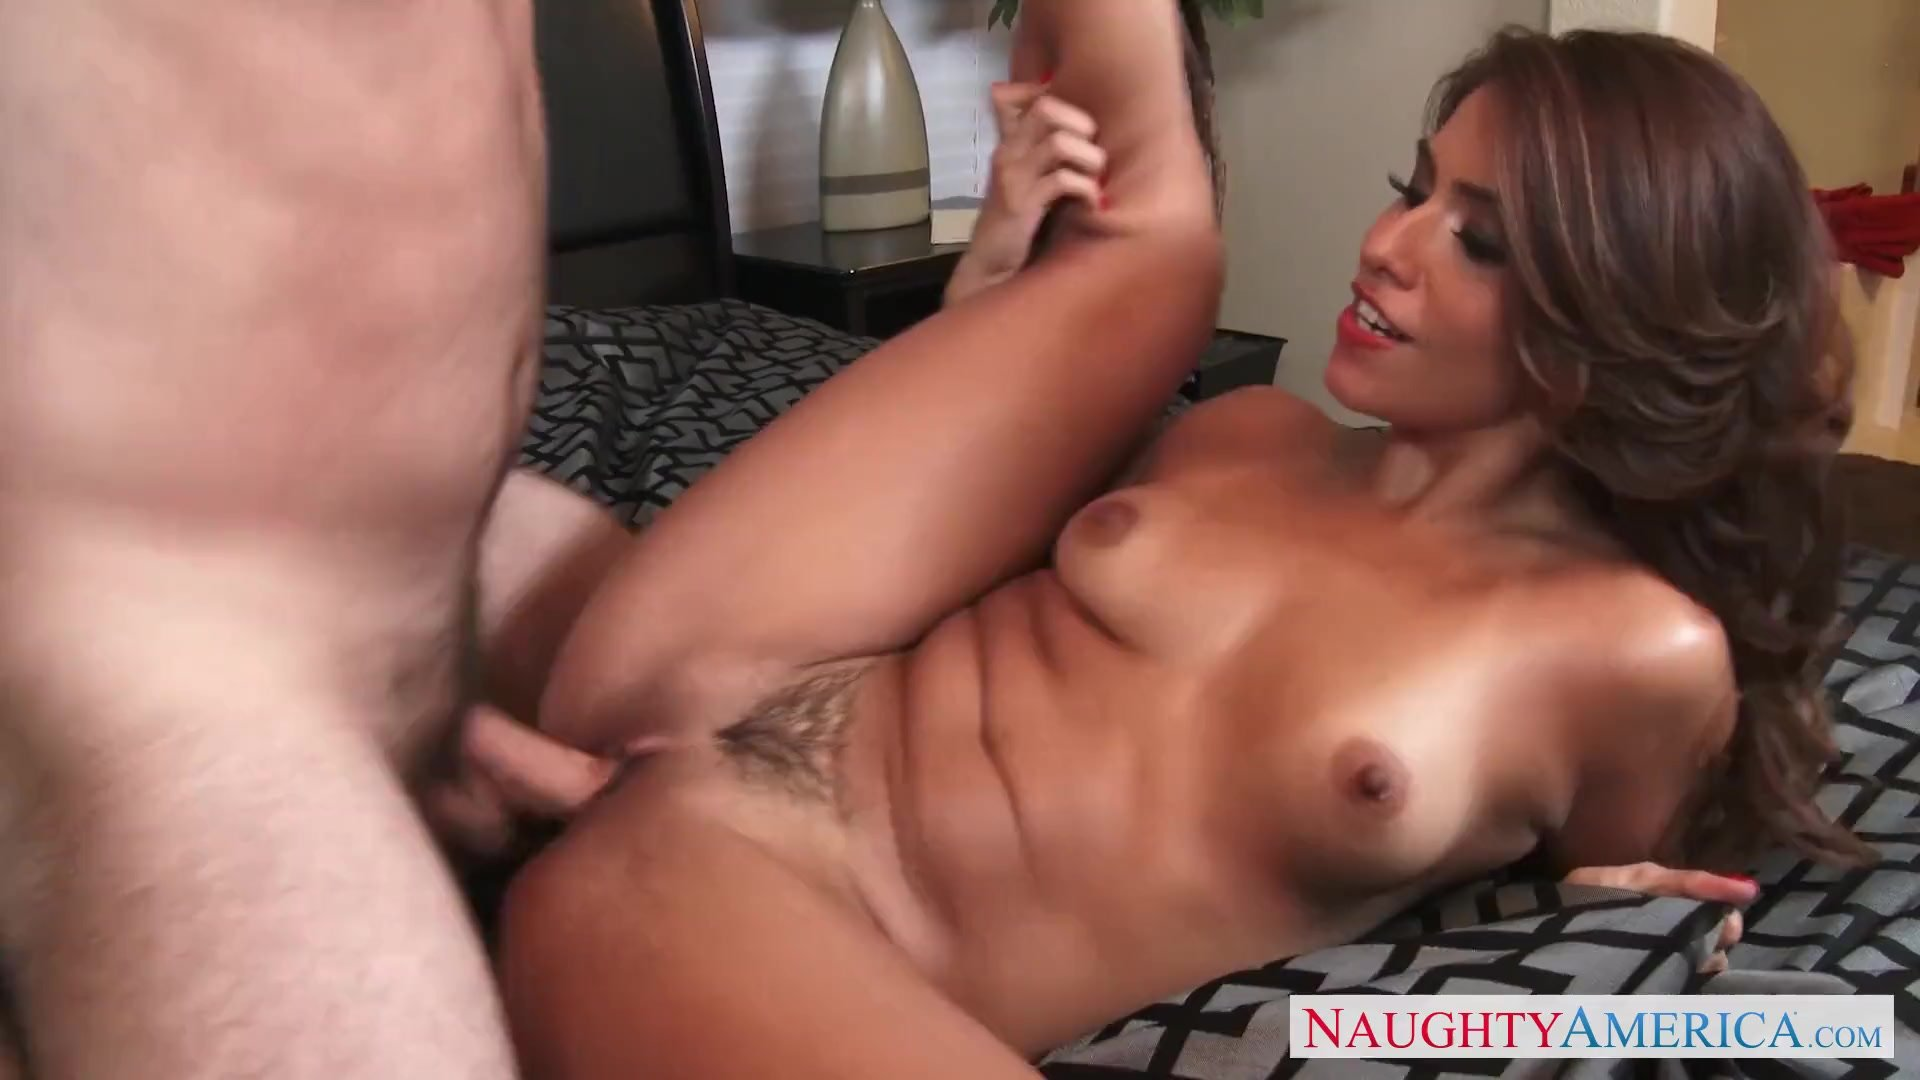 Naughty America - Isabella de Santos fucks her friend's husband